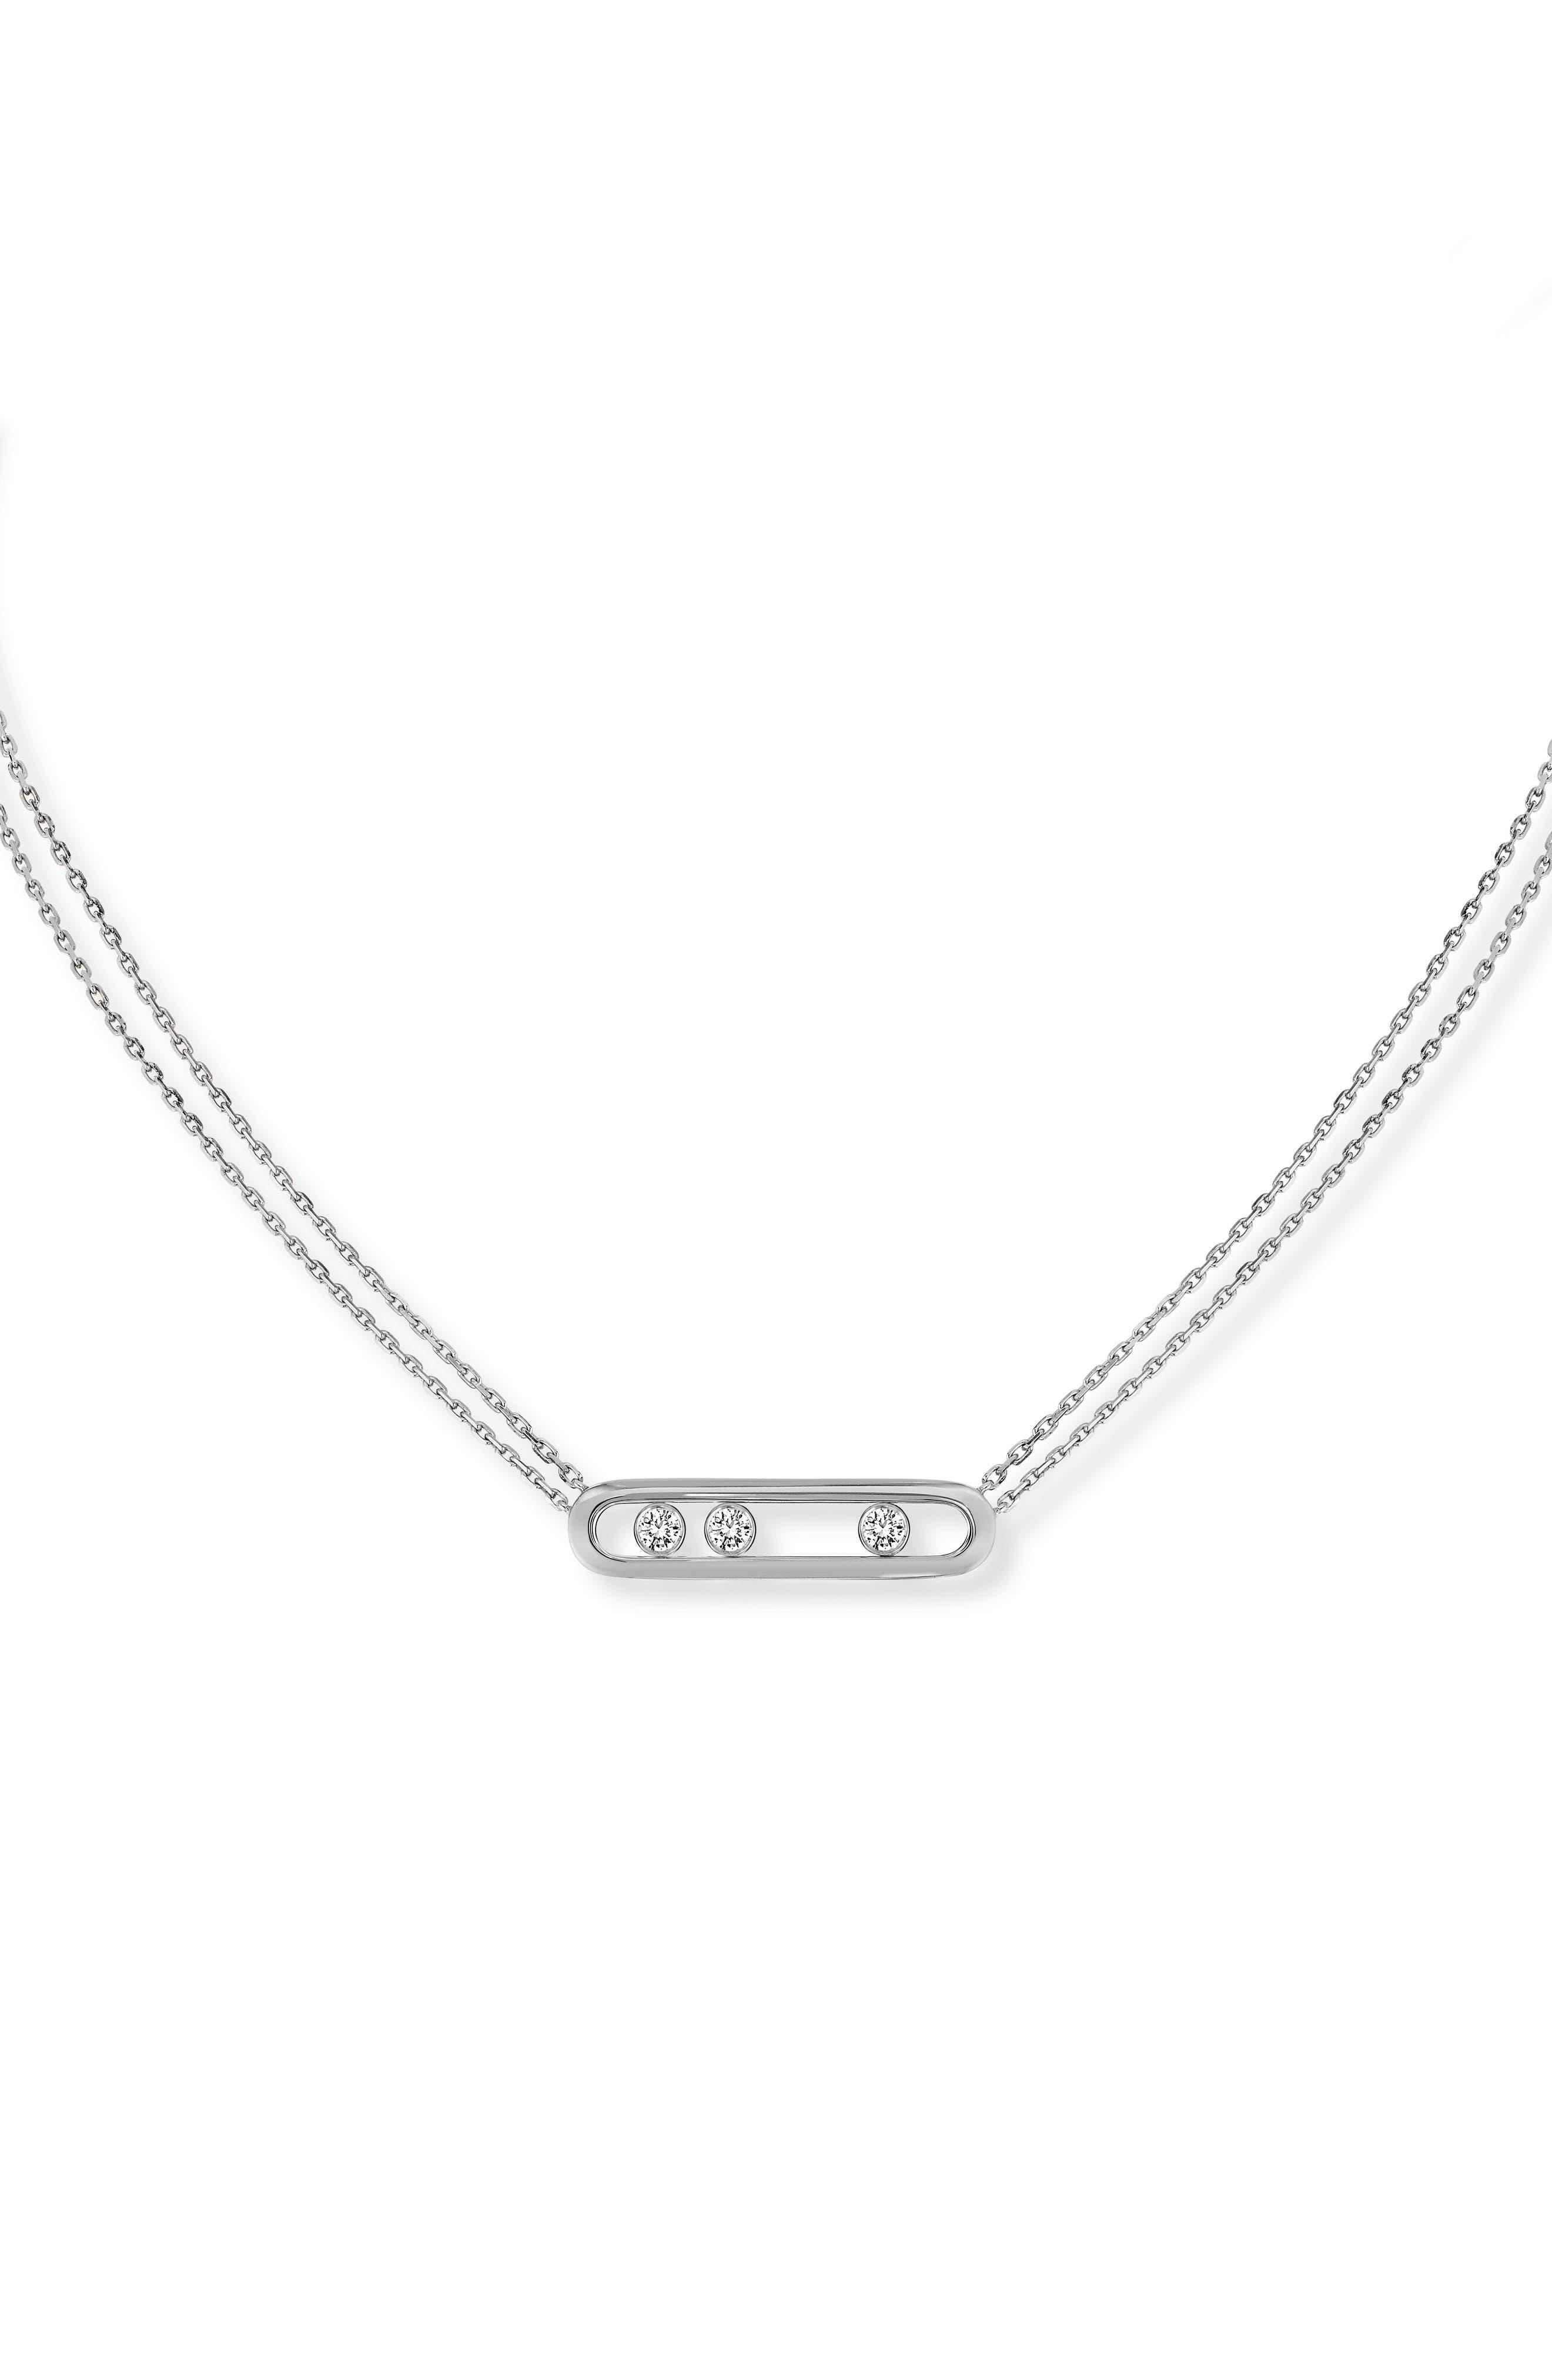 Two Strand Move Diamond Necklace,                         Main,                         color, WHITE GOLD